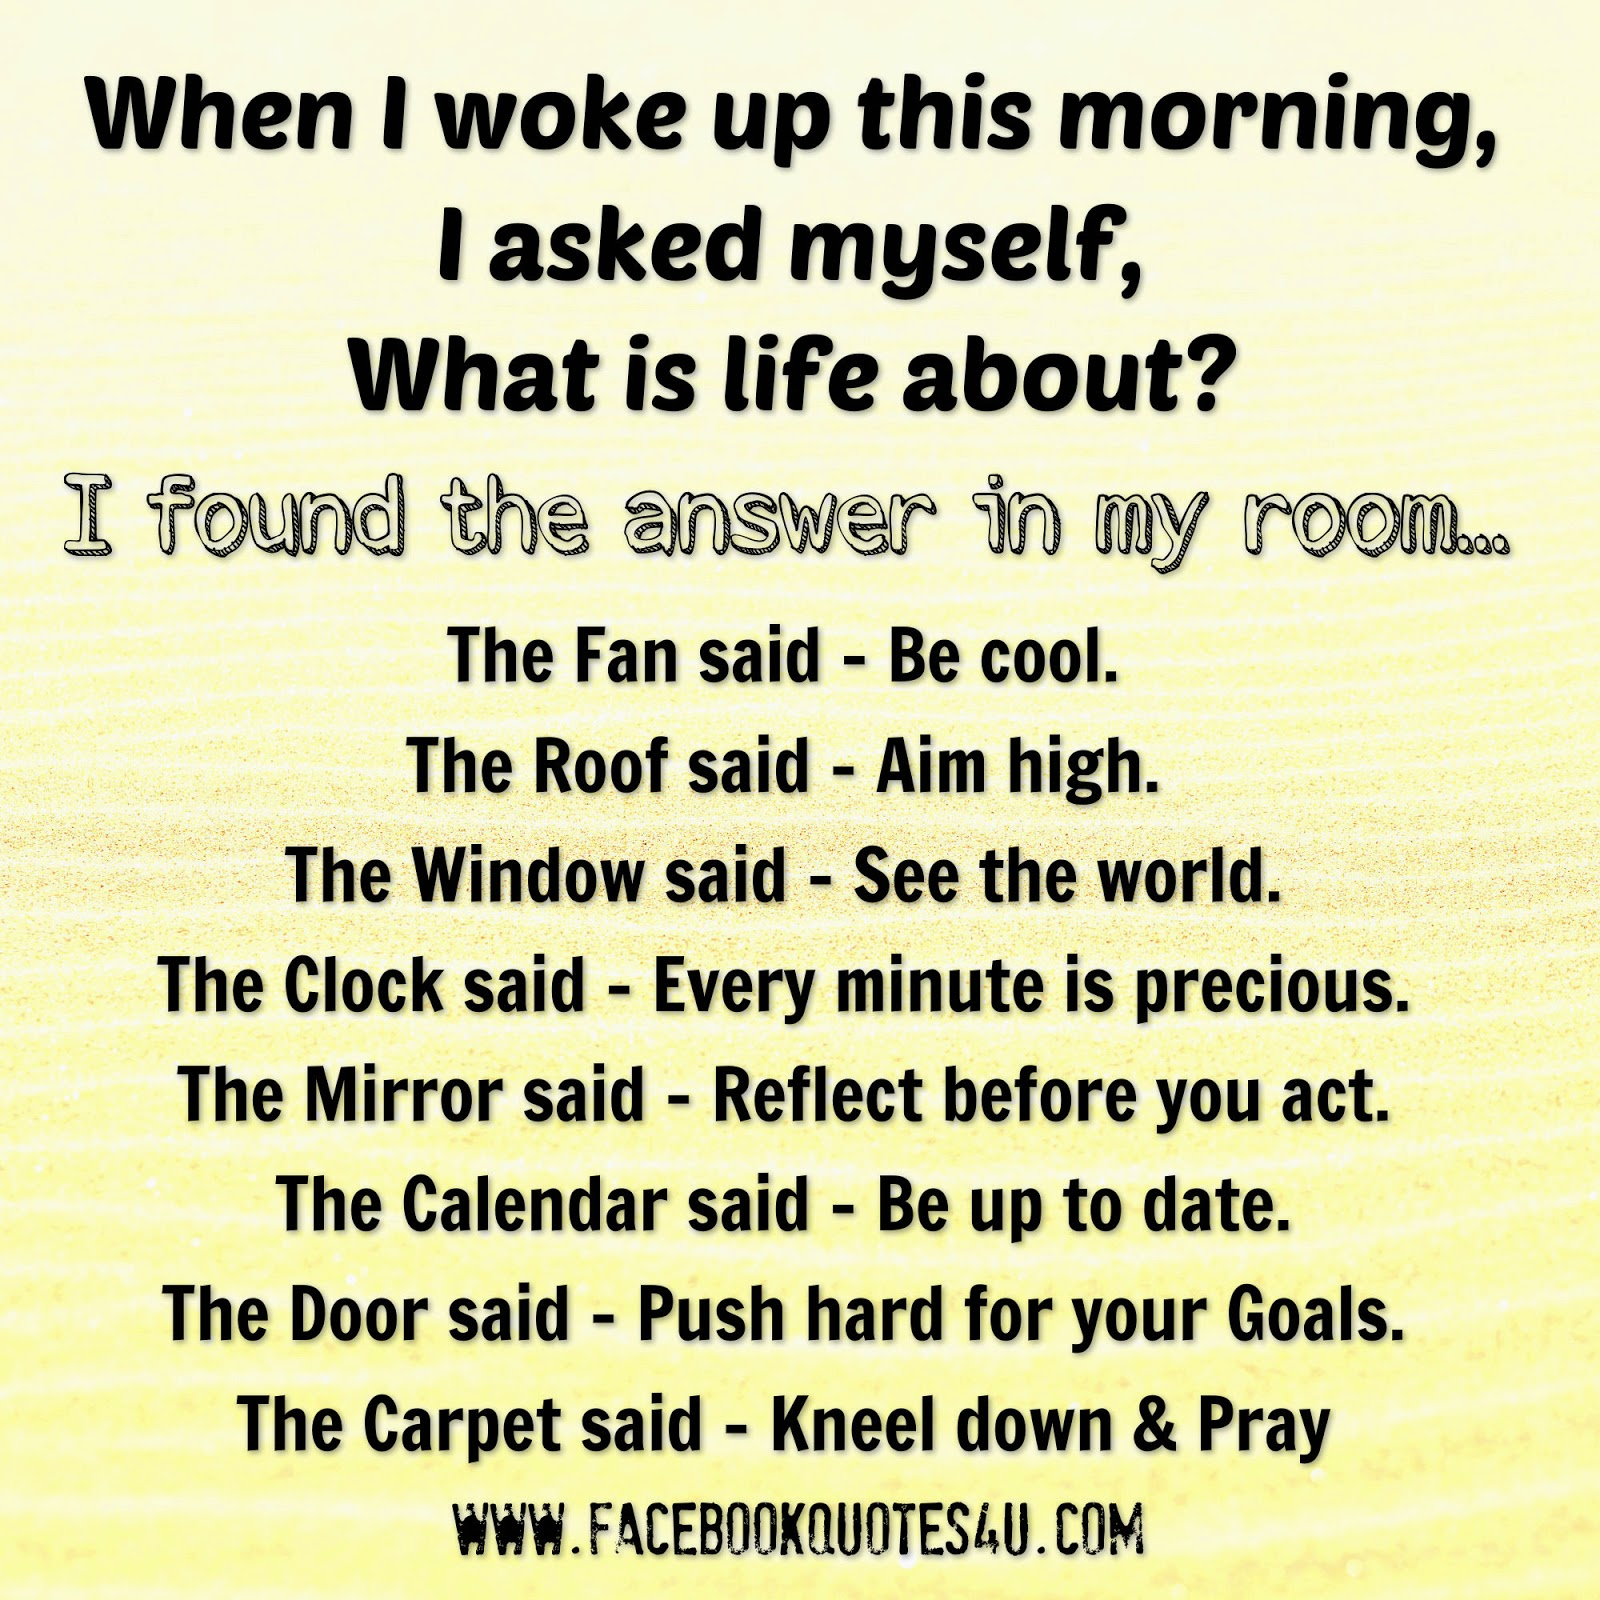 Morning Life Quotes Mesmerizing Quotes When I Woke Up This Morning I Asked Myself